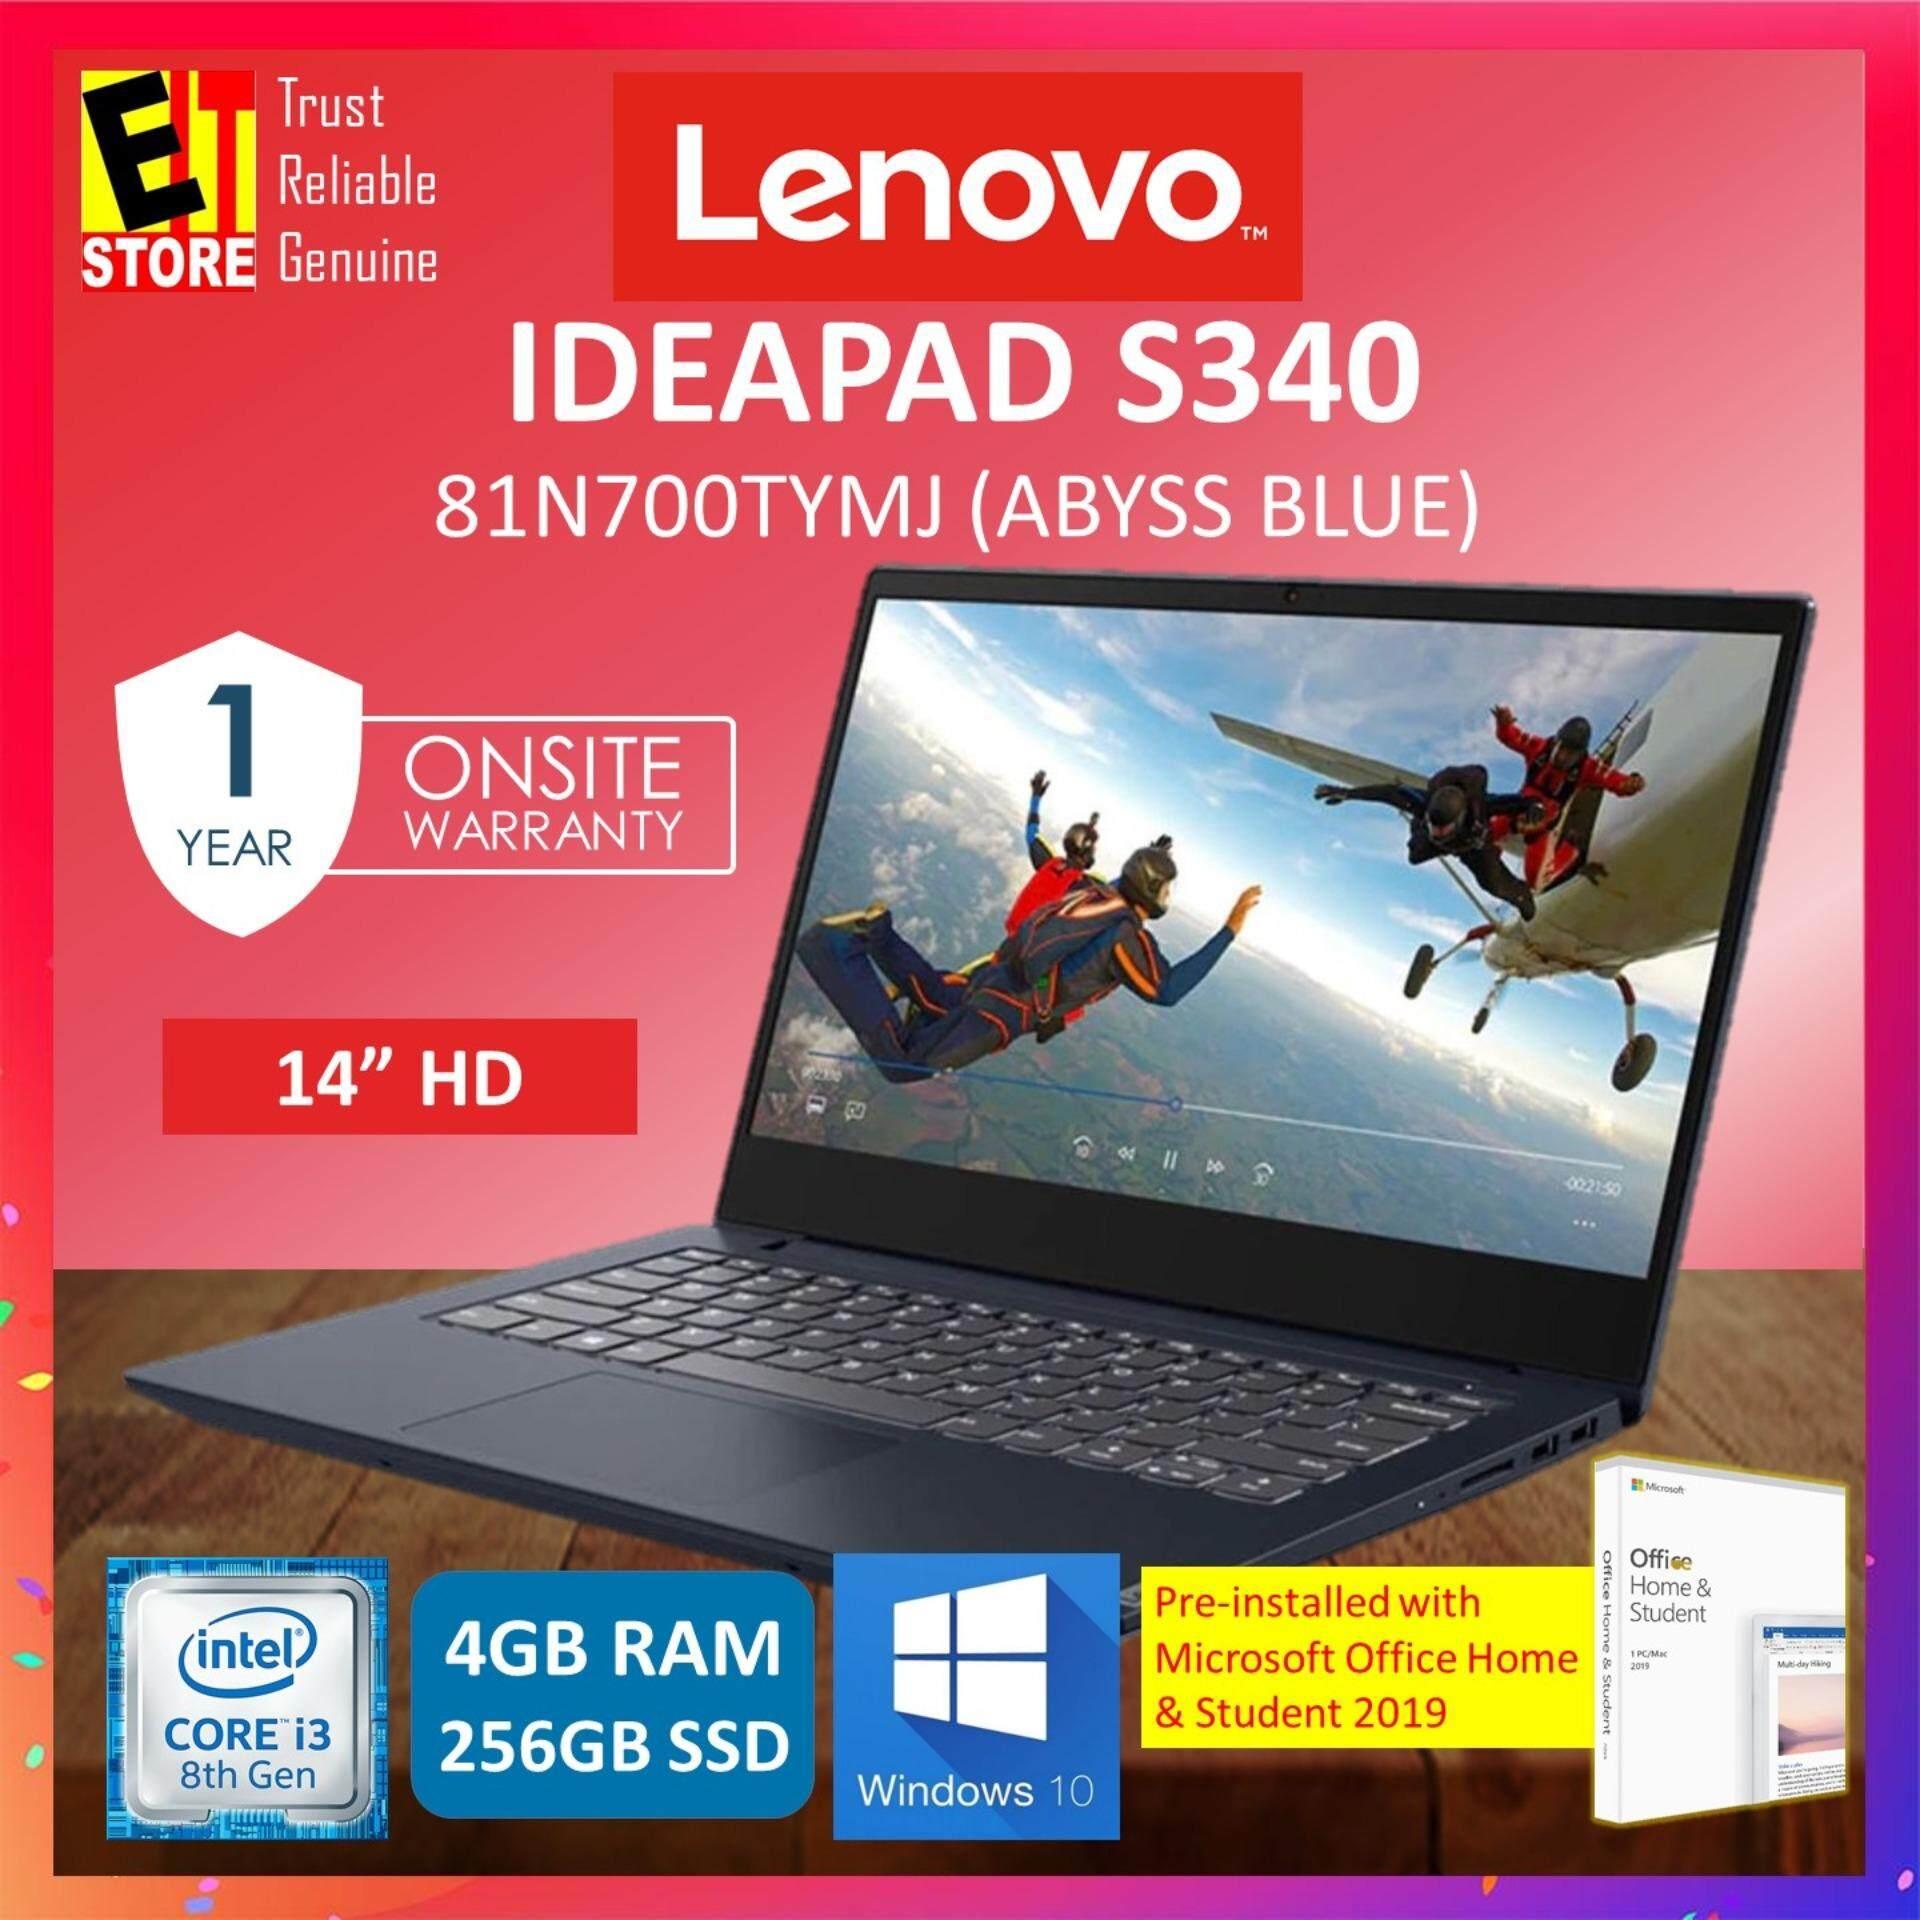 LENOVO IDEAPAD S340 LAPTOP 81N700TYMJ (ABYSS BLUE) (I3-8145U/4GB/256GB SSD/14 HD/W10/OFF HOME & STUDENT 2019/1YR ONSITE) + BAG Malaysia